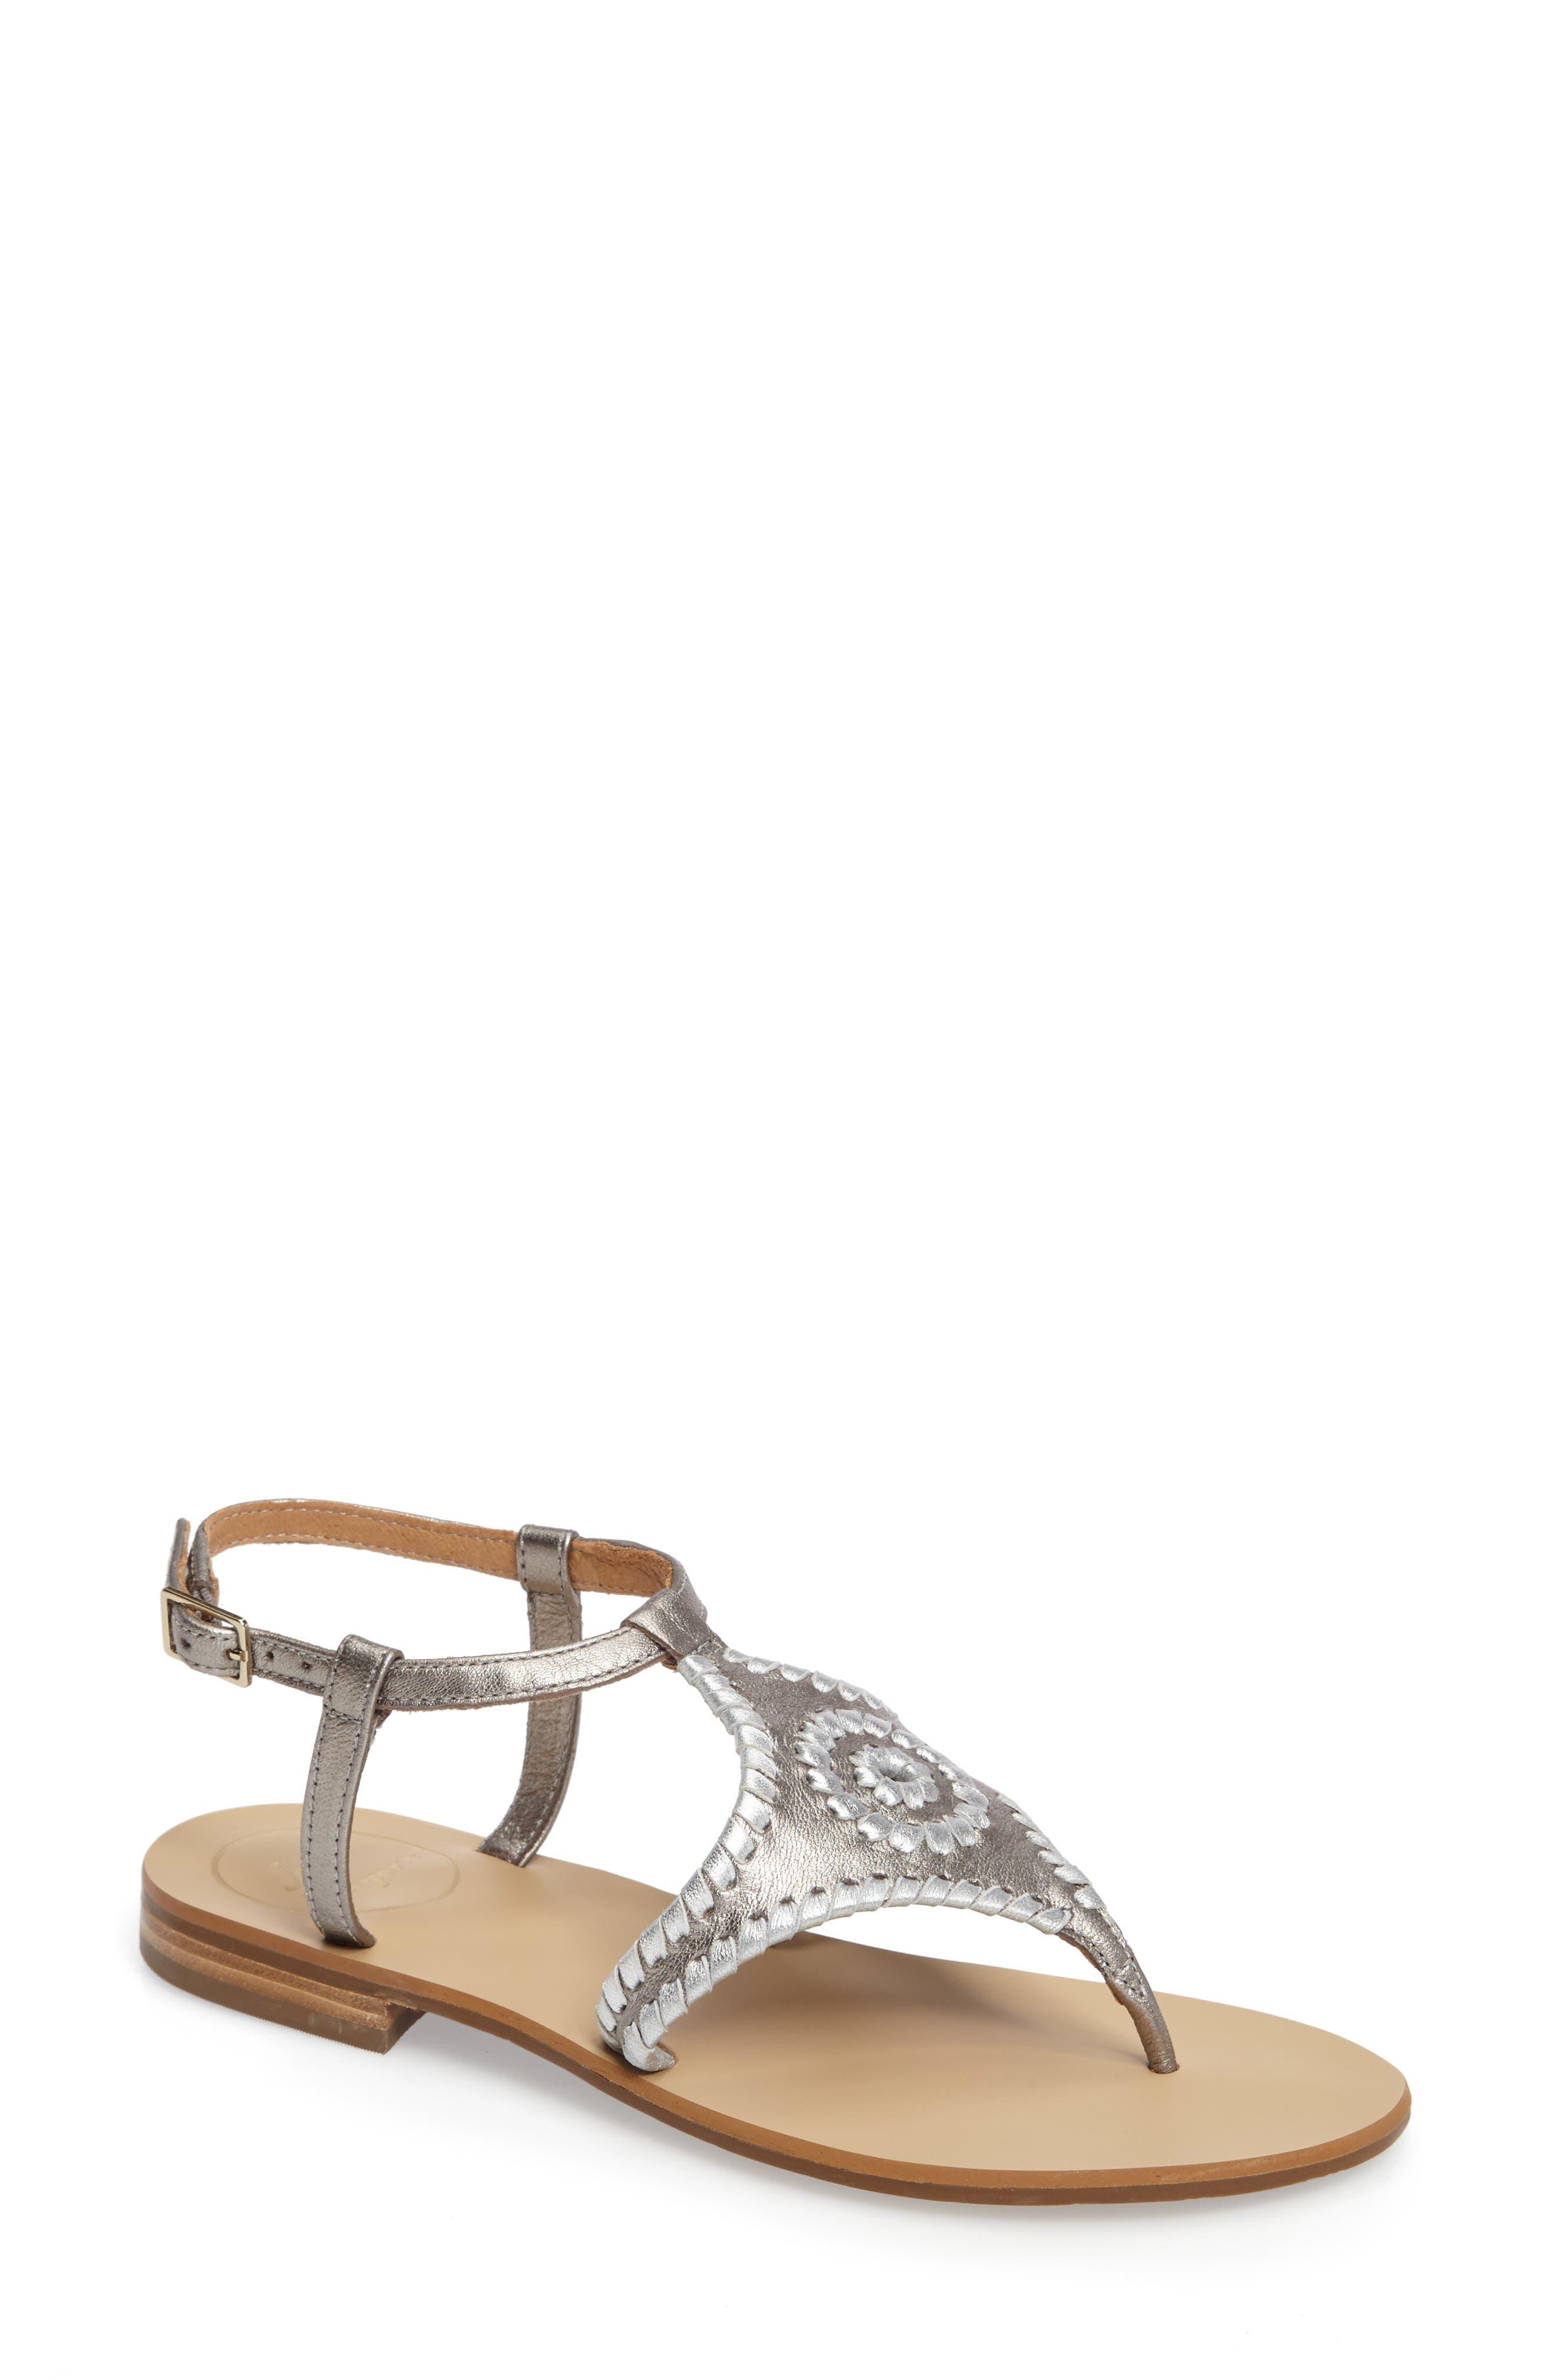 Alternate Image 1 Selected - Jack Rogers 'Maci' Flat Sandal (Women)